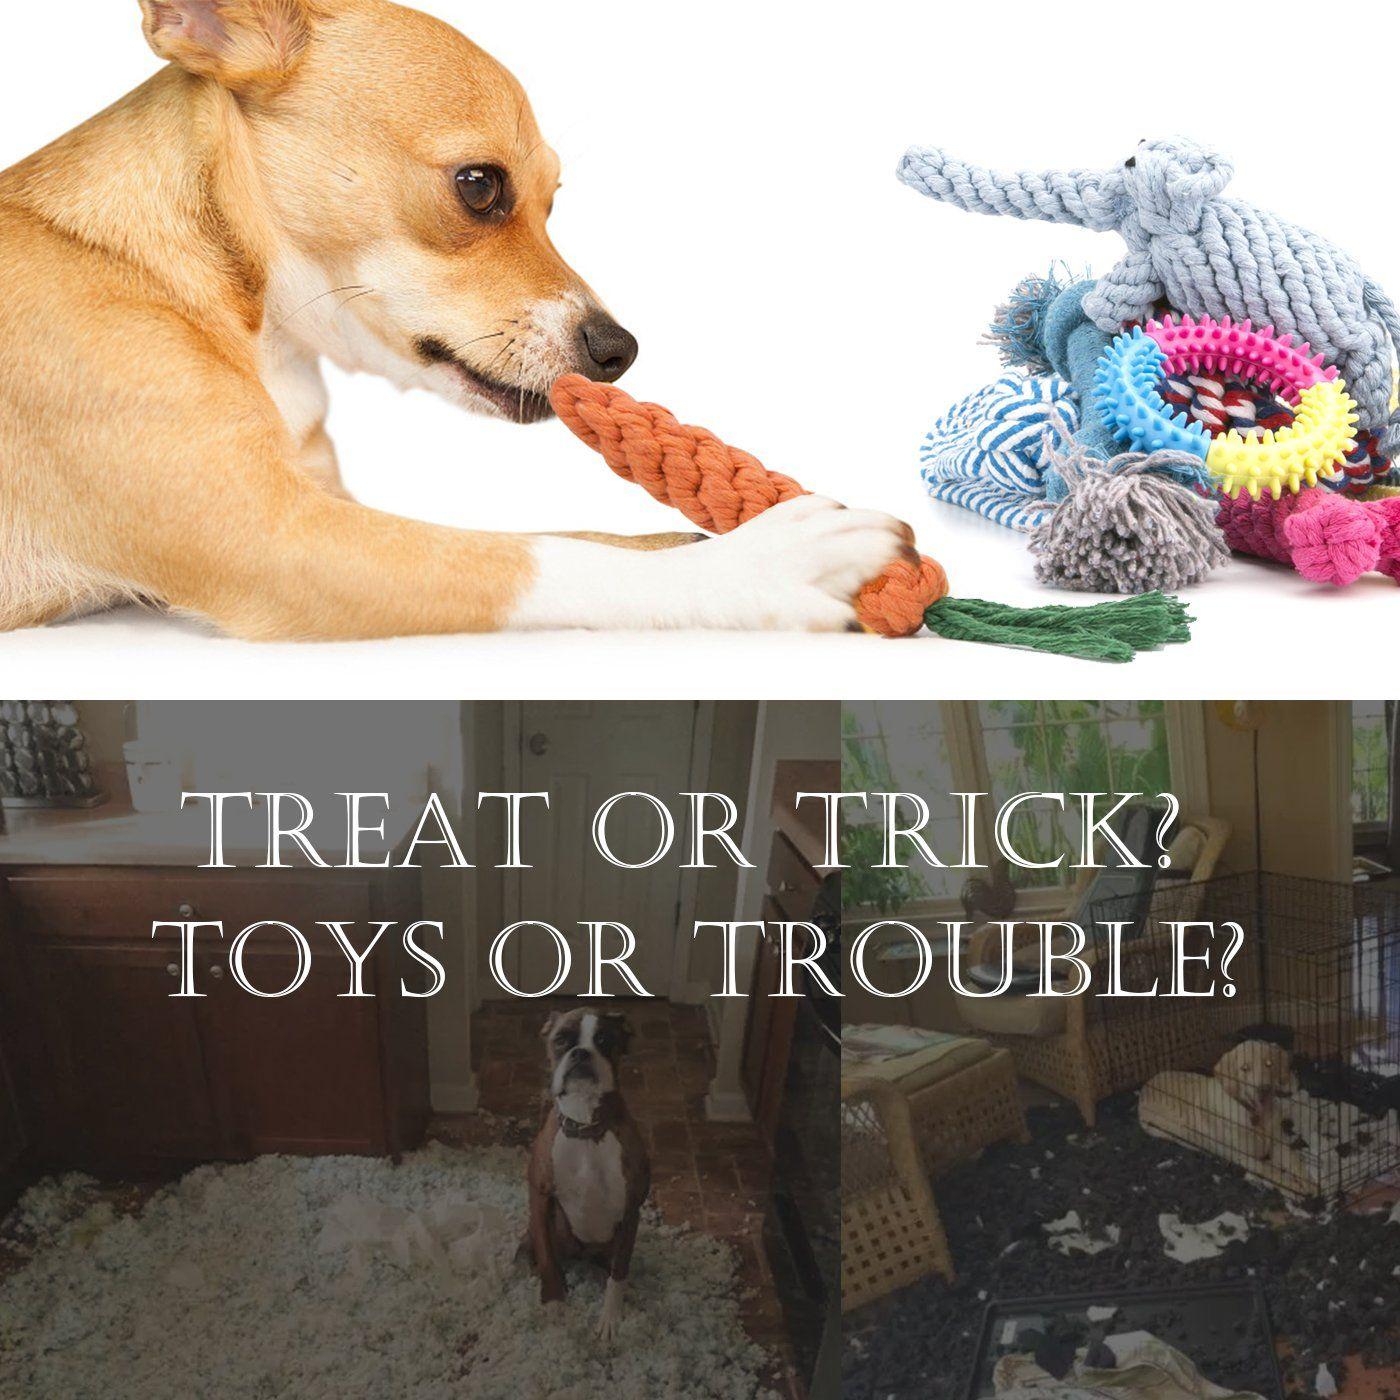 Dog Chew Toys 10 Set Jekeno Dog Bones Ball Rope For Puppy Small